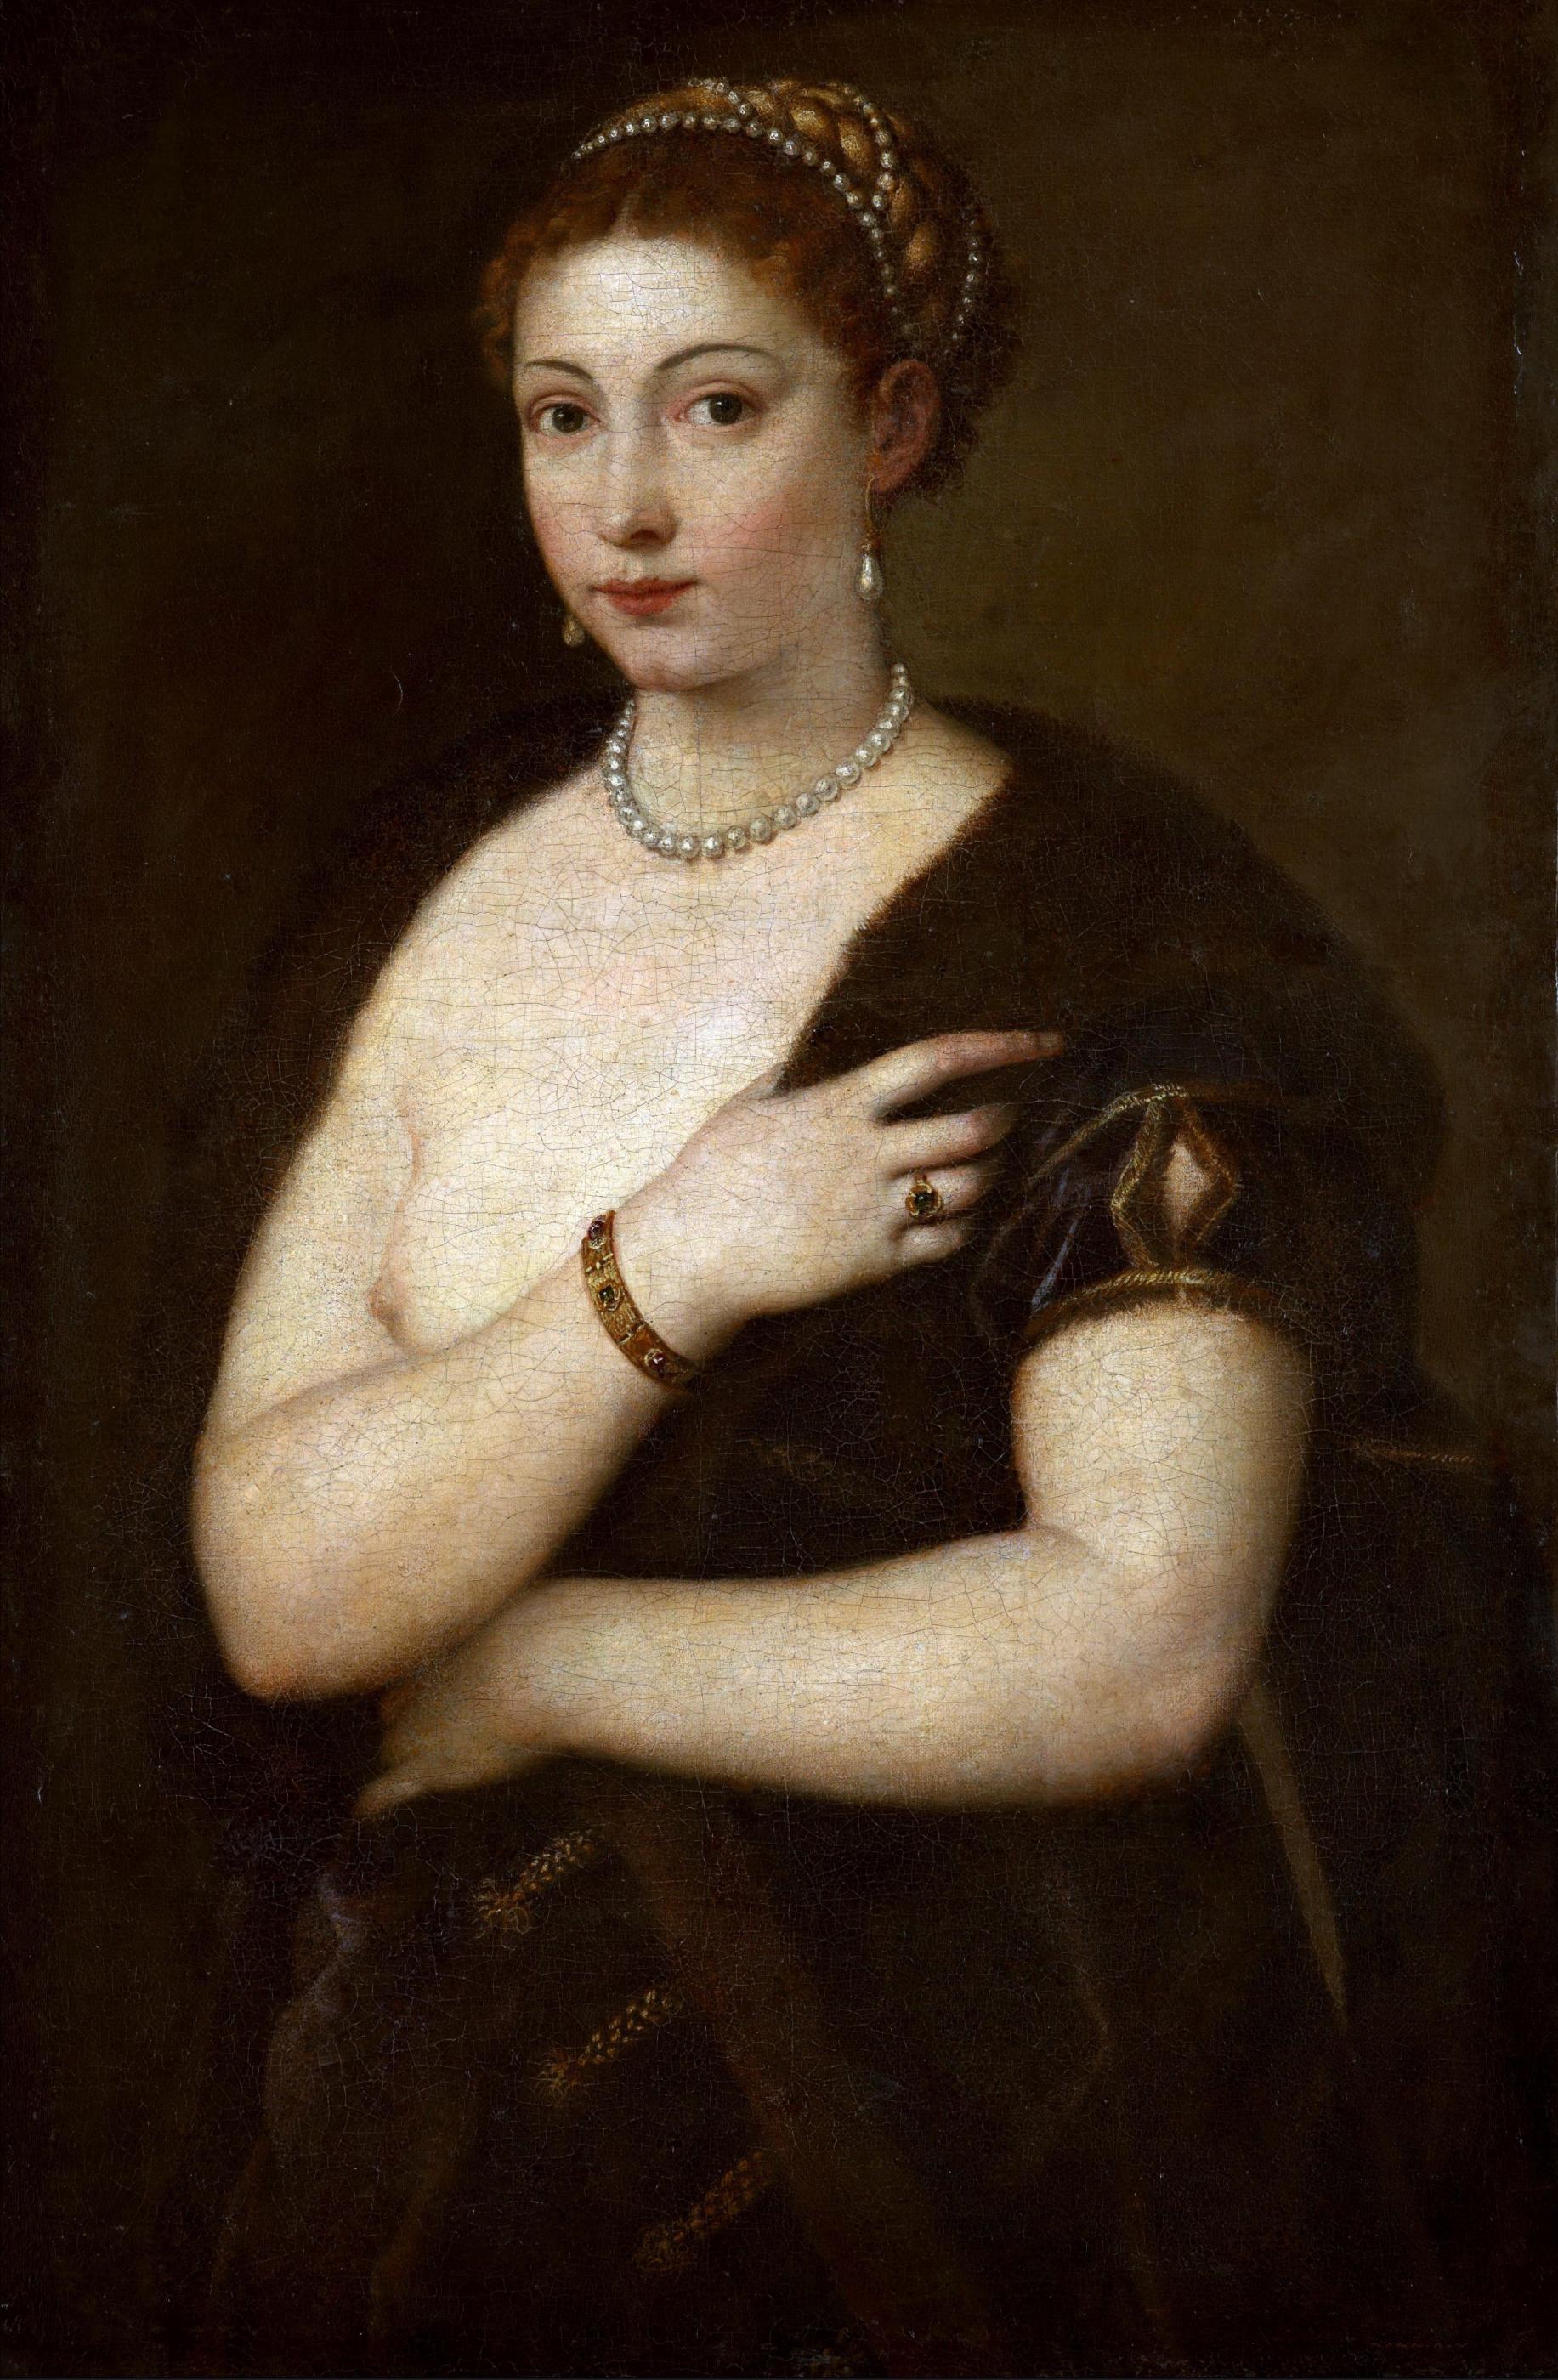 Тициан Вечеллио. Портрет девушки с мехом